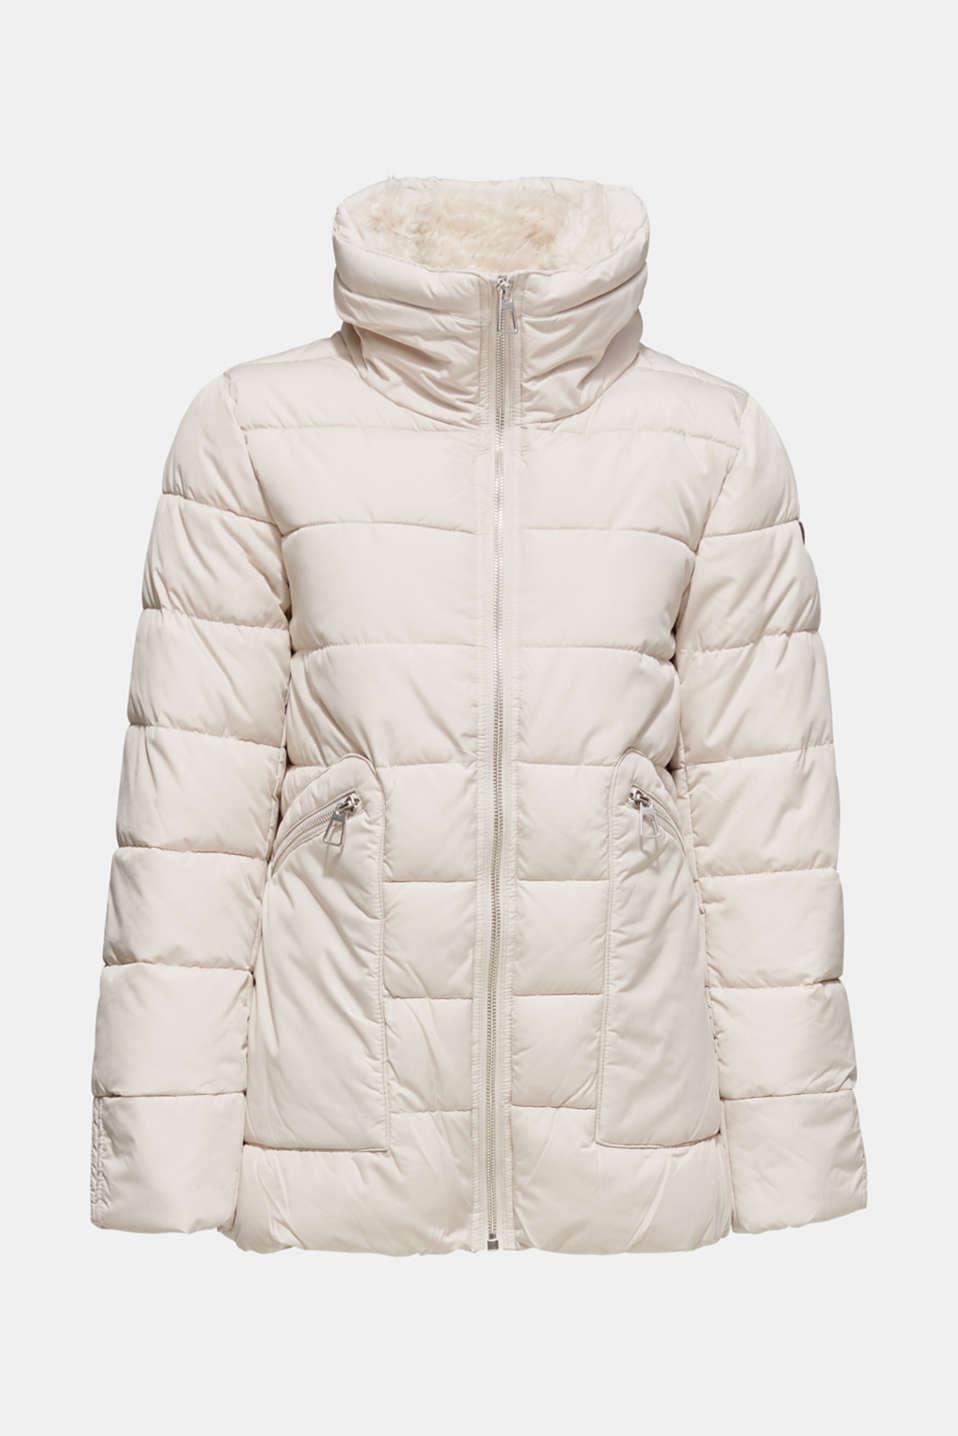 Jackets outdoor woven, LIGHT BEIGE, detail image number 8